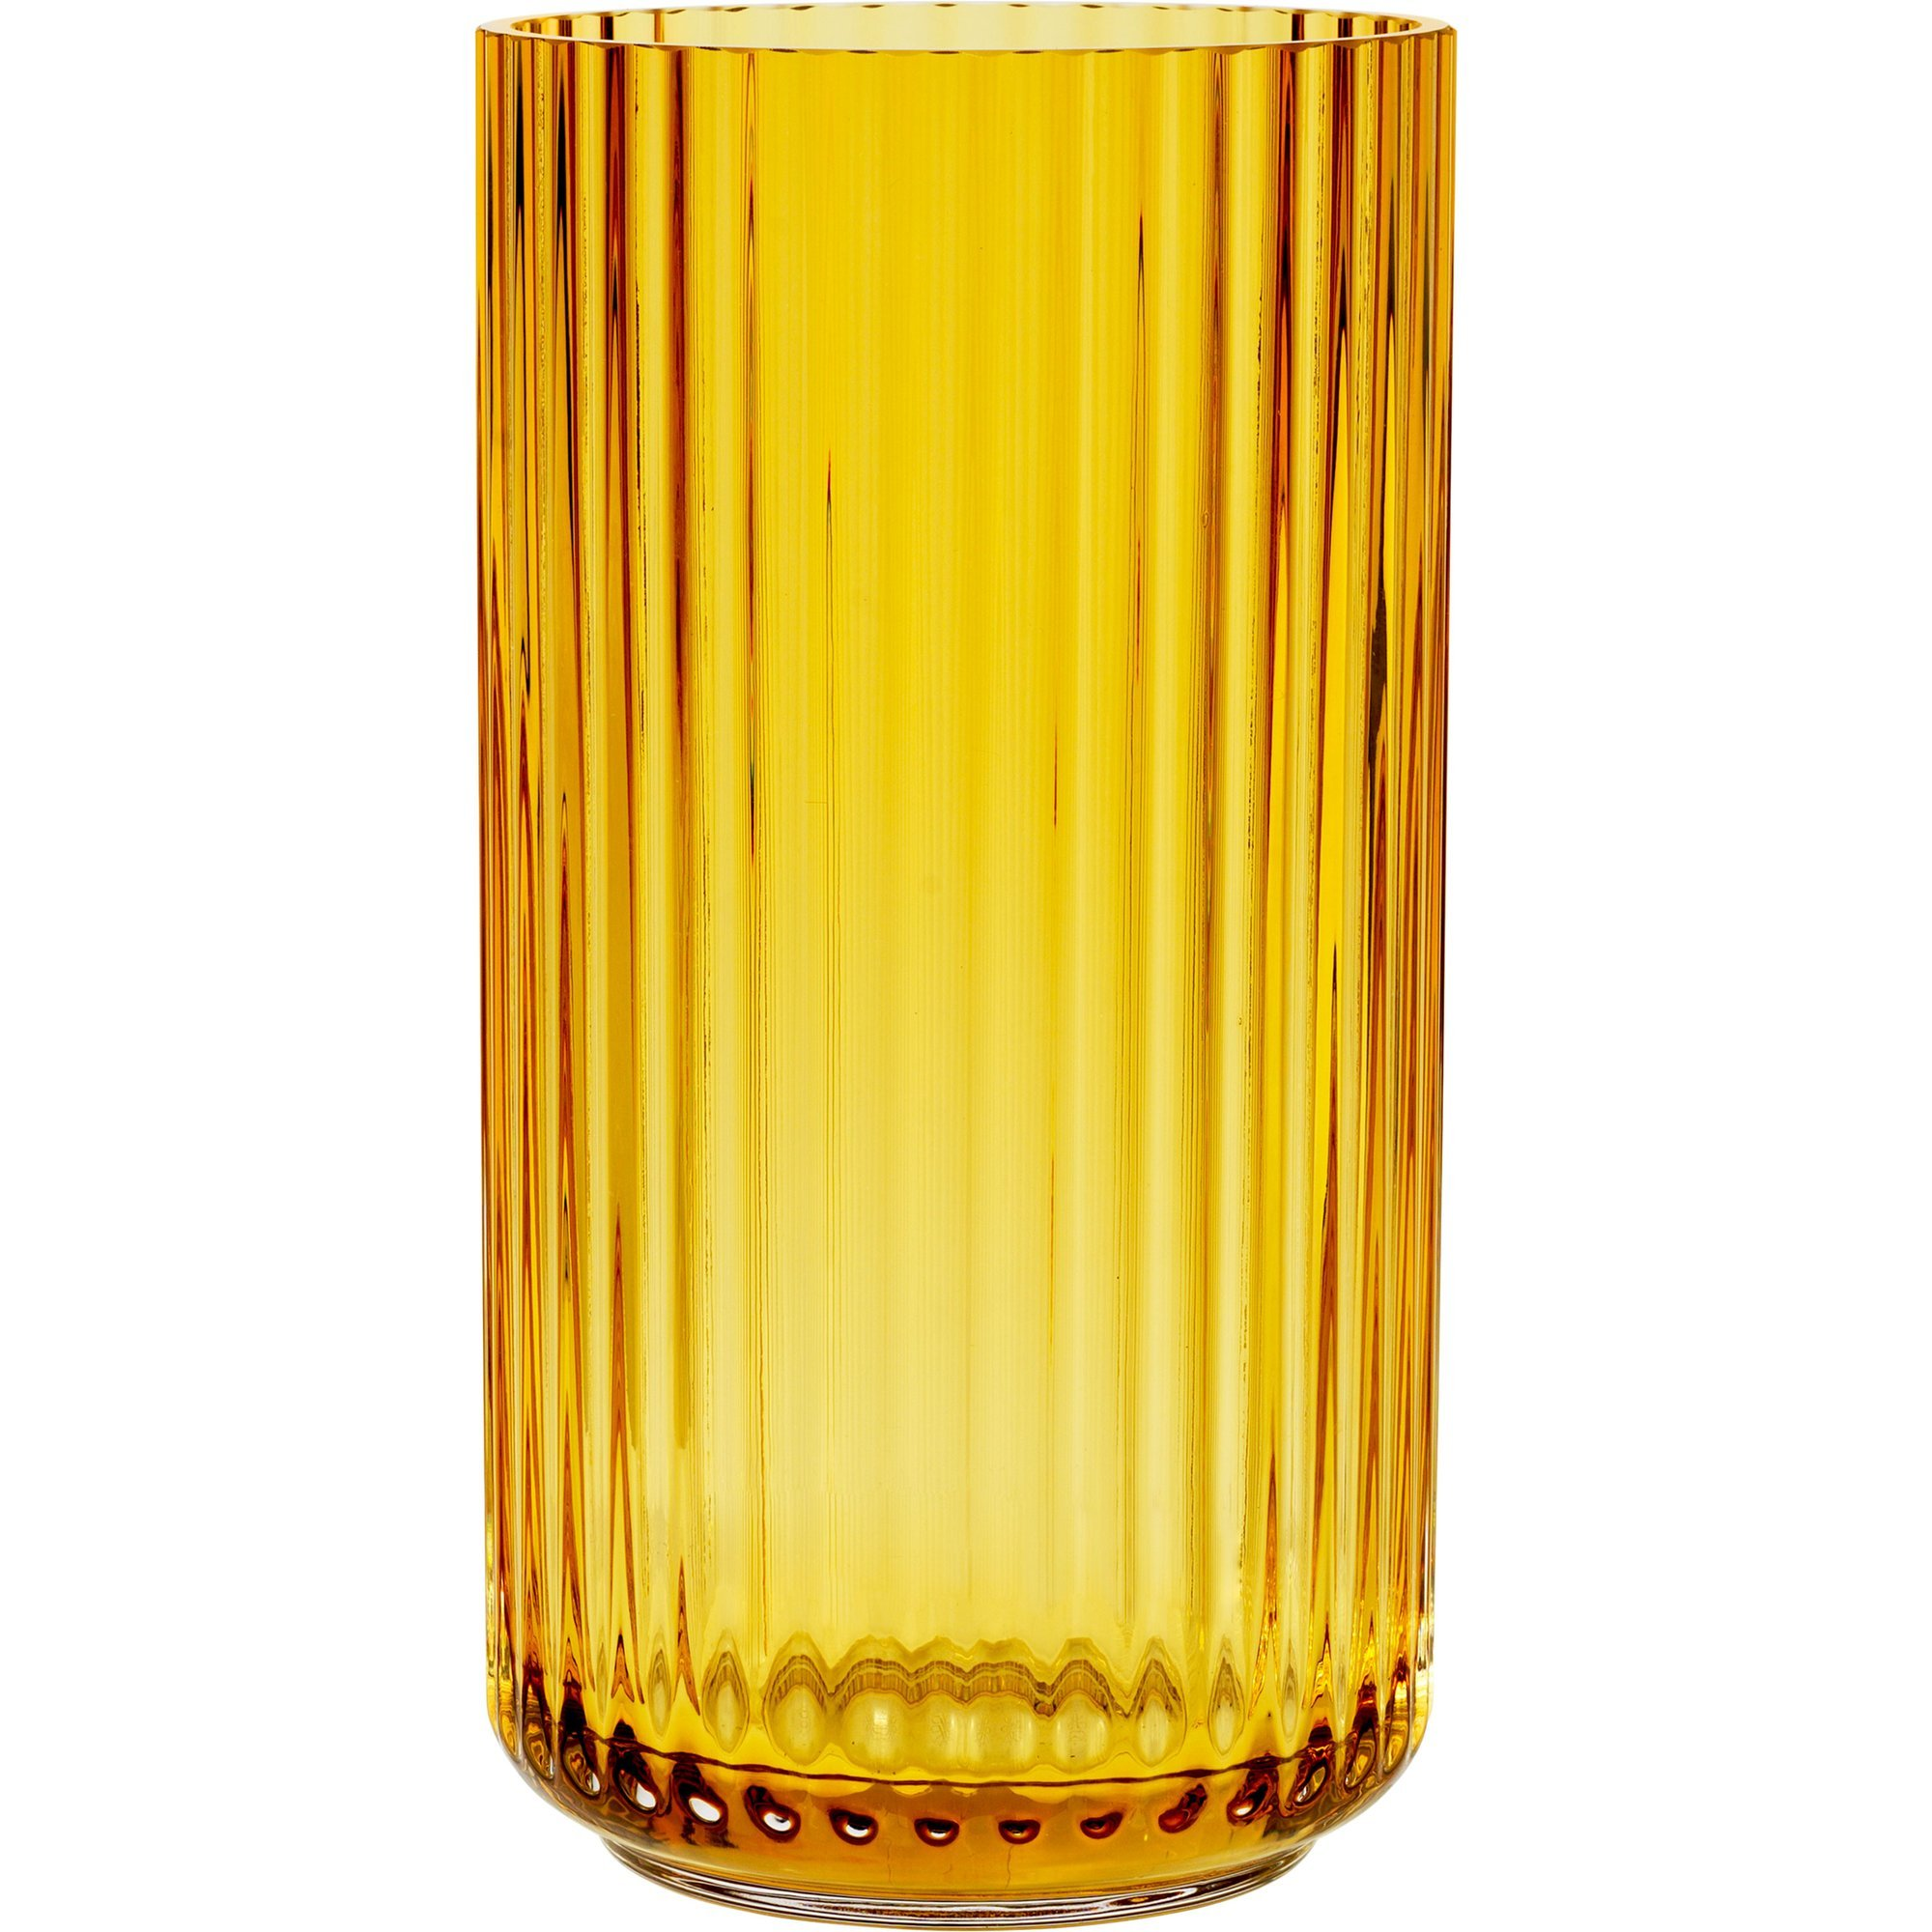 Lyngby Porcelæn Lyngbyvasen 15 cm. glas – amber